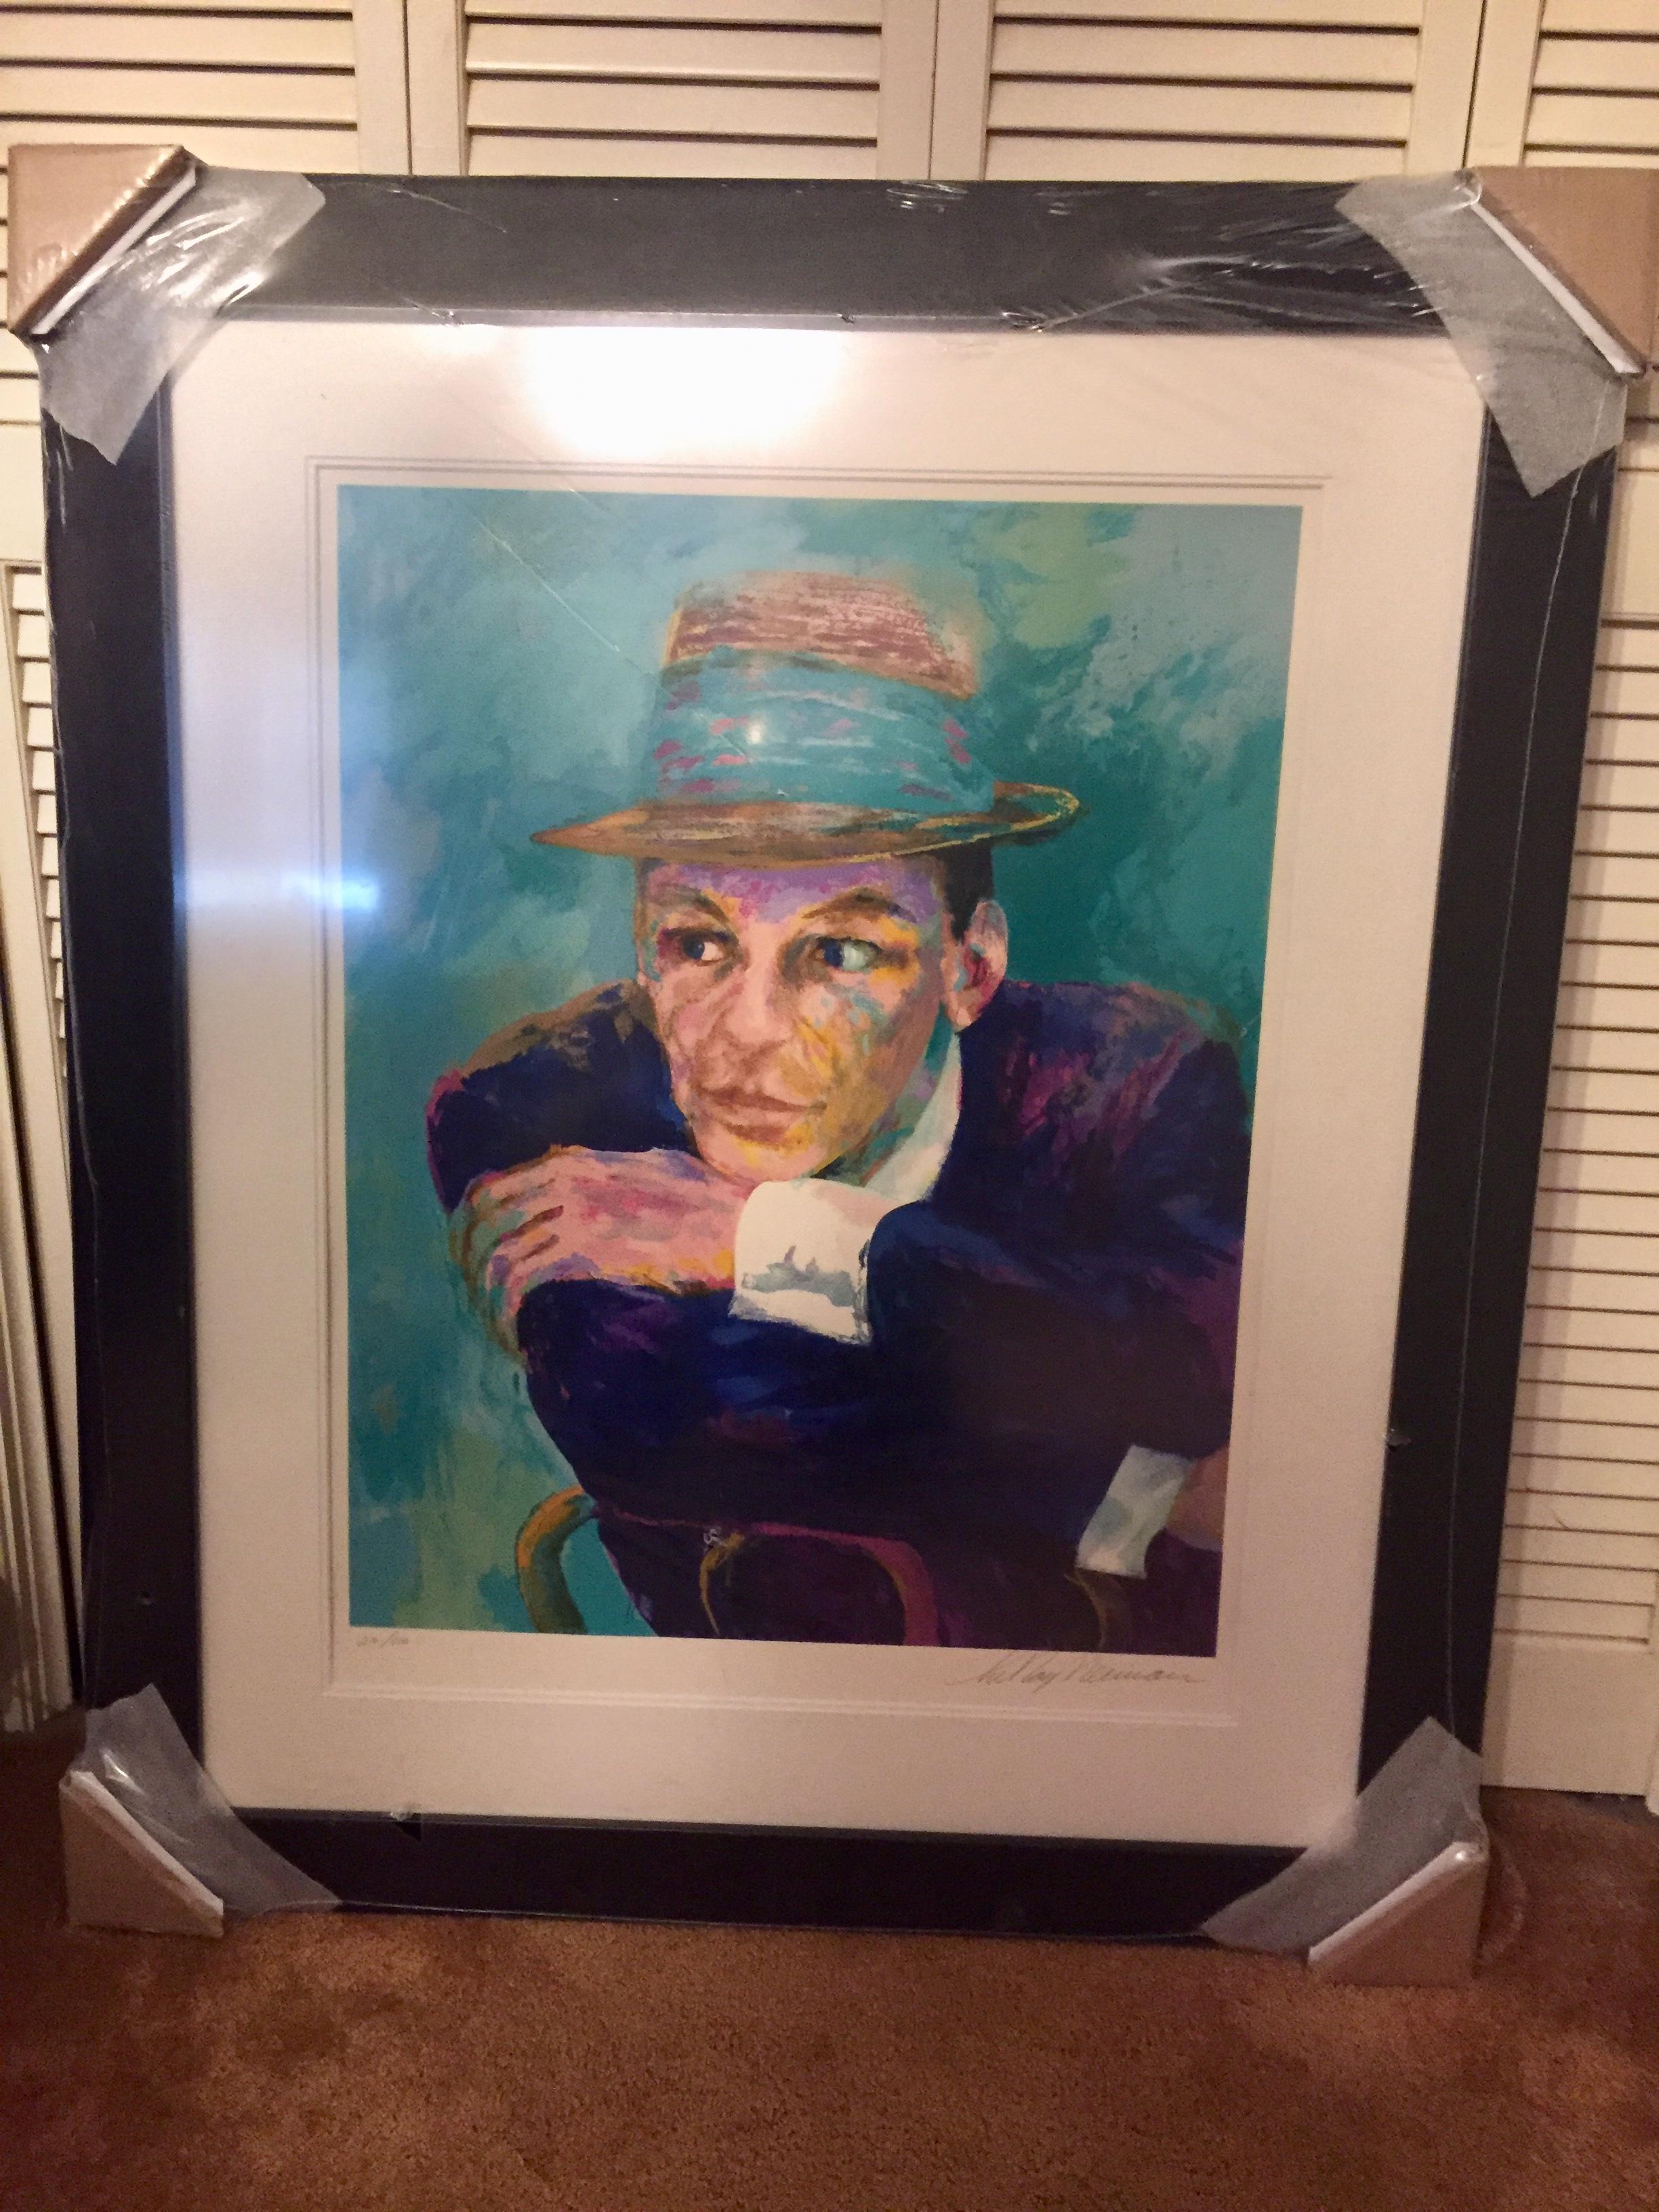 DML1007 – Frank Sinatra by Leroy Neiman